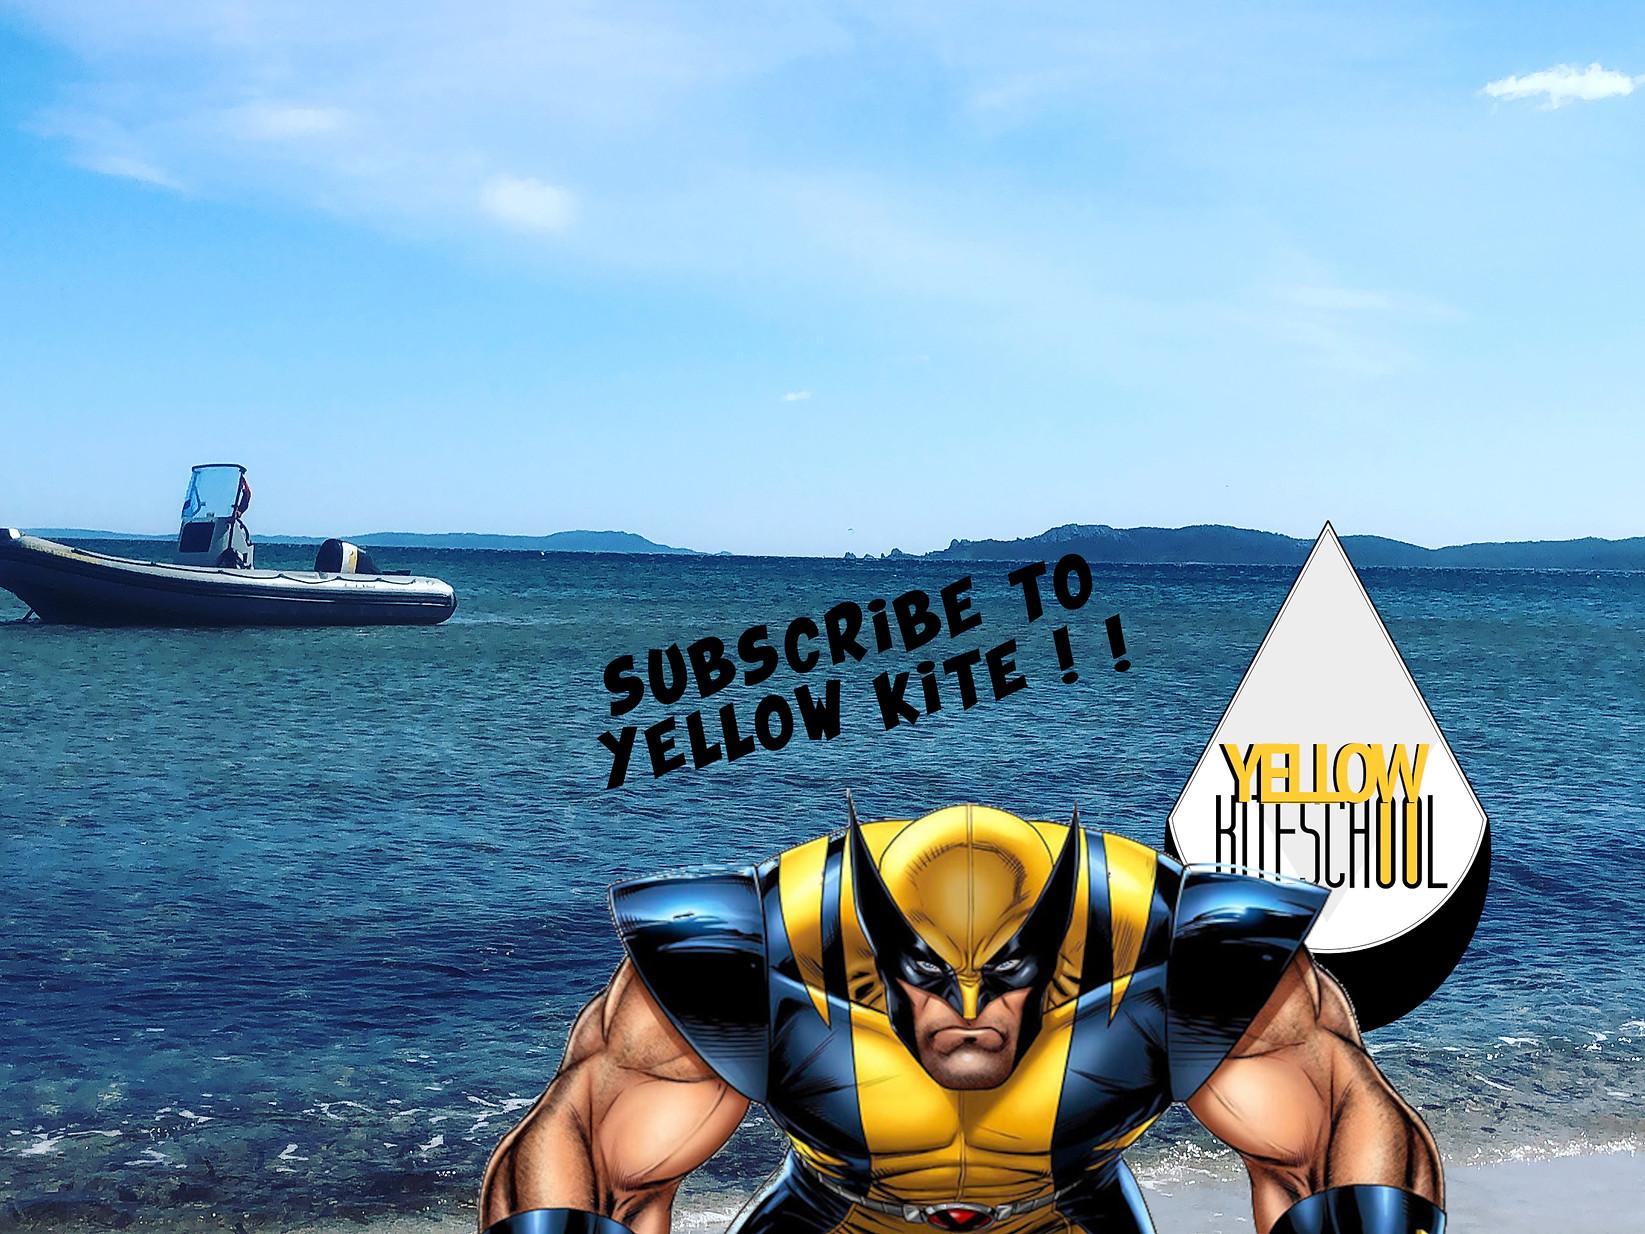 Yellow kite school école de kitesurf var hyères yellow shop